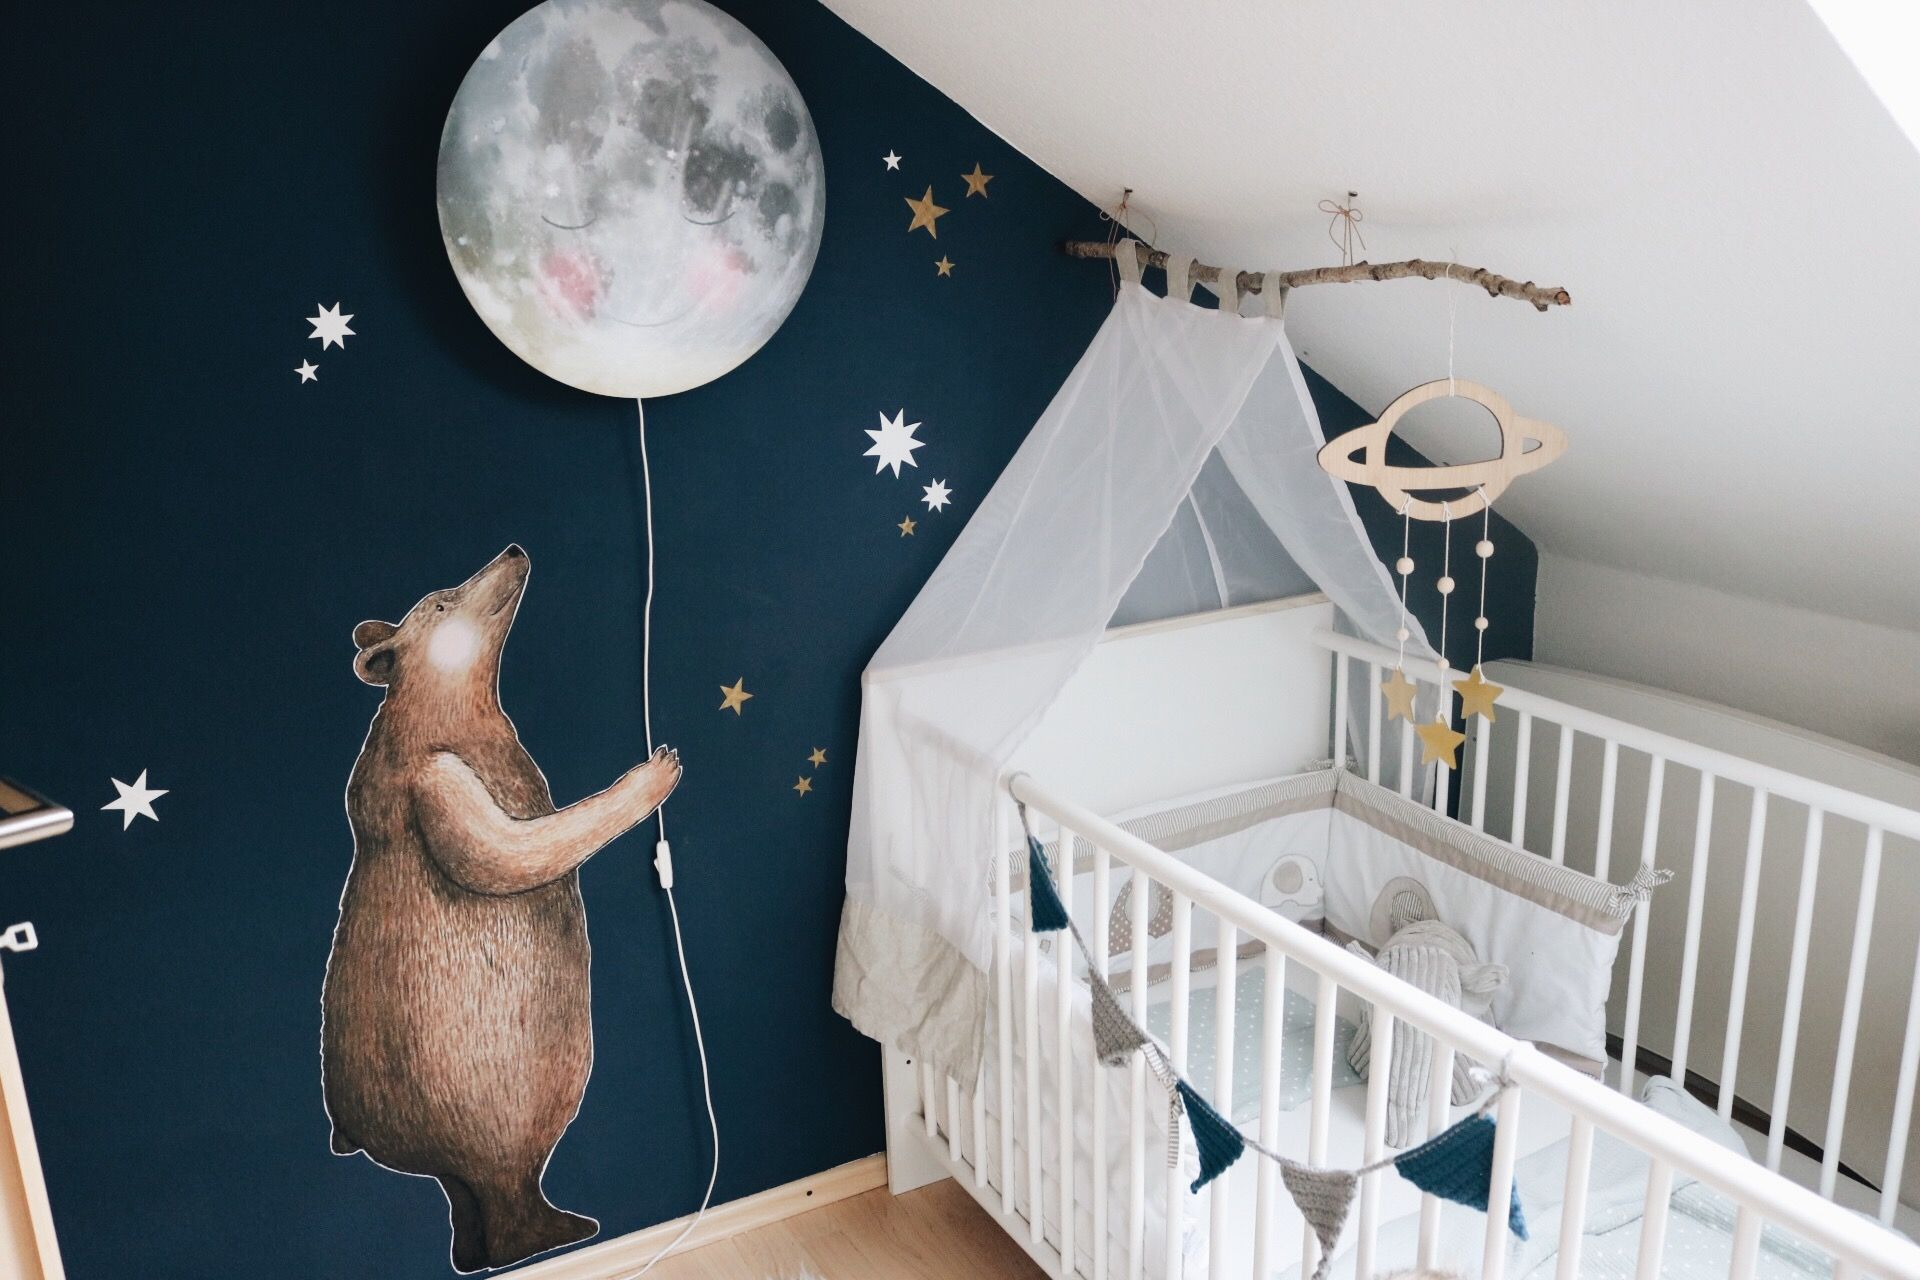 Kinderzimmer Babyzimmer Hartendief wandtattoo Bär Mond mondlampe ...